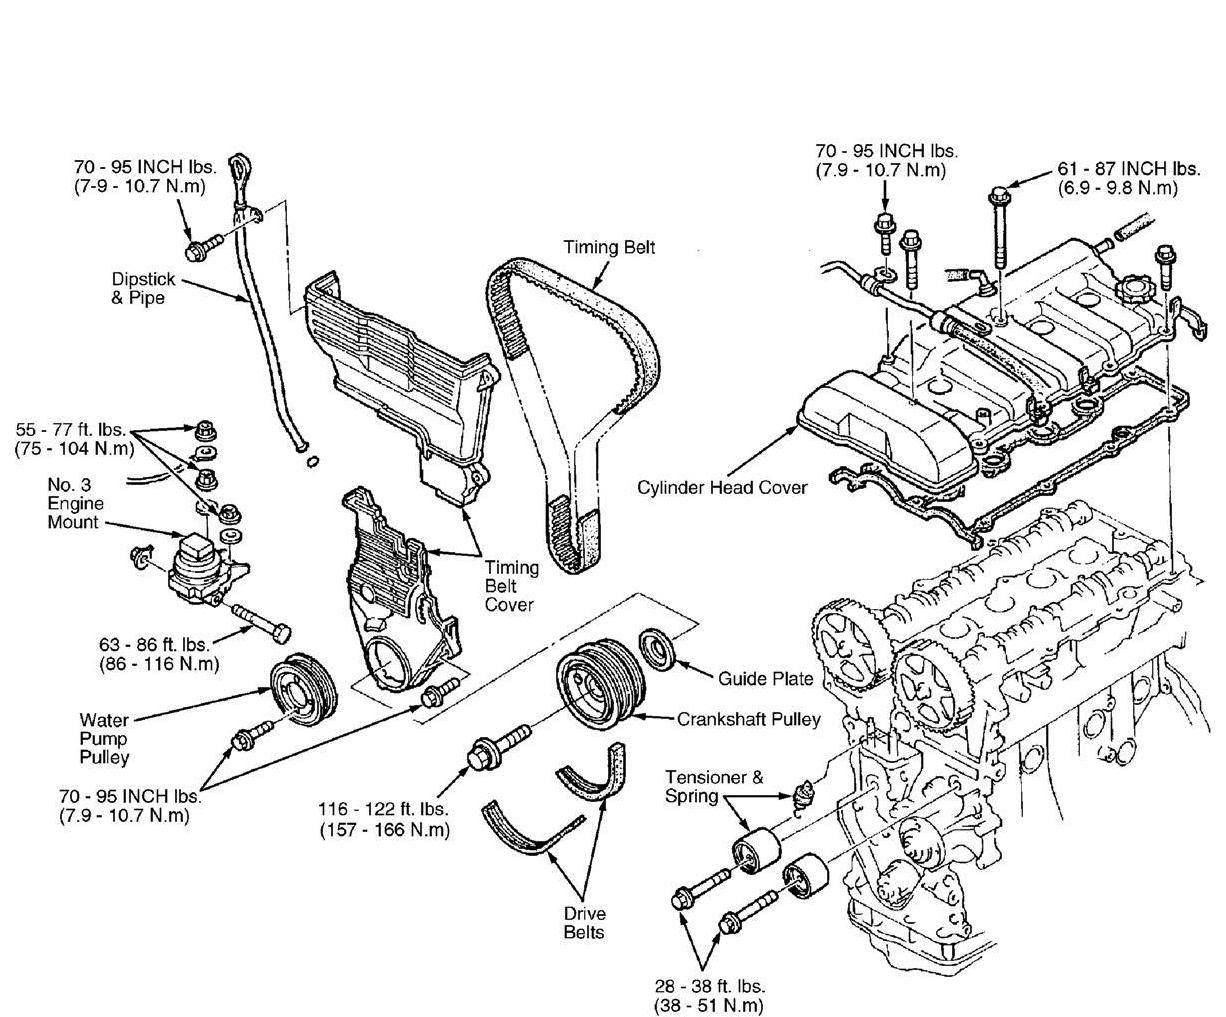 1999 Mazda 626 Engine Diagram Wiring Diagram Frankmotors Es